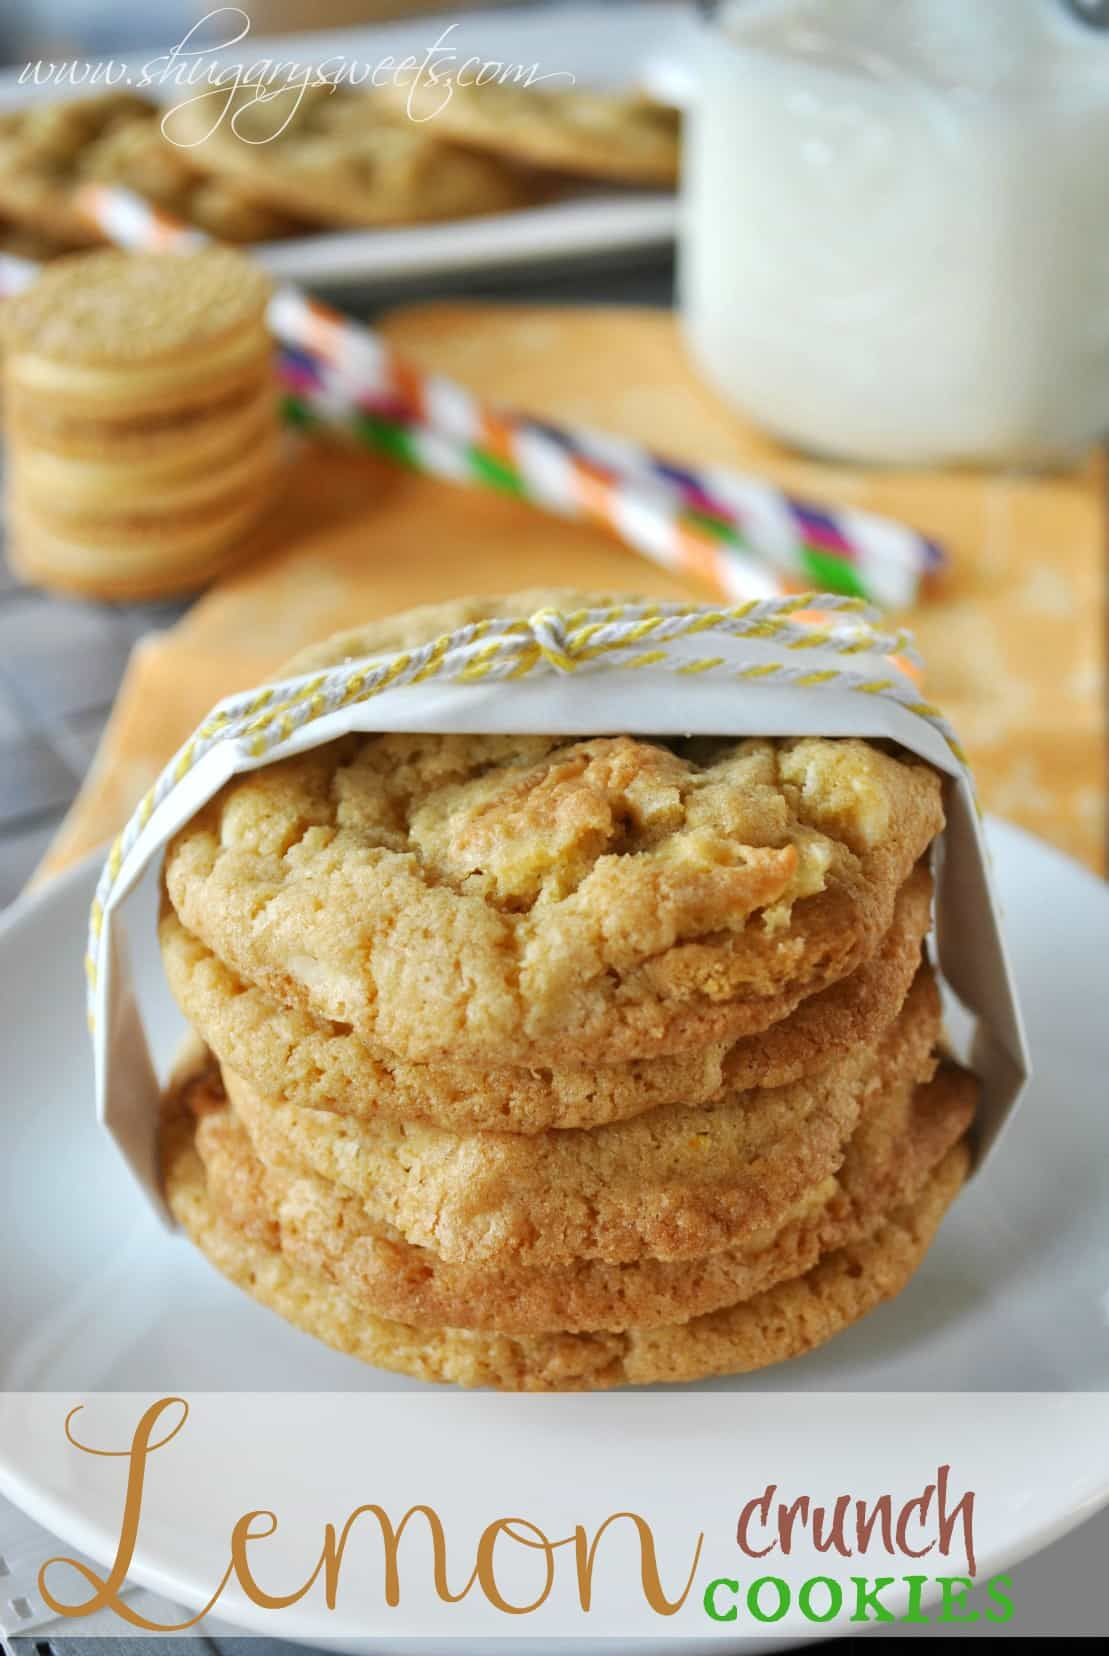 Shugary Sweets: Lemon Crunch Cookies {Heirloom Cookie Sheets Giveaway